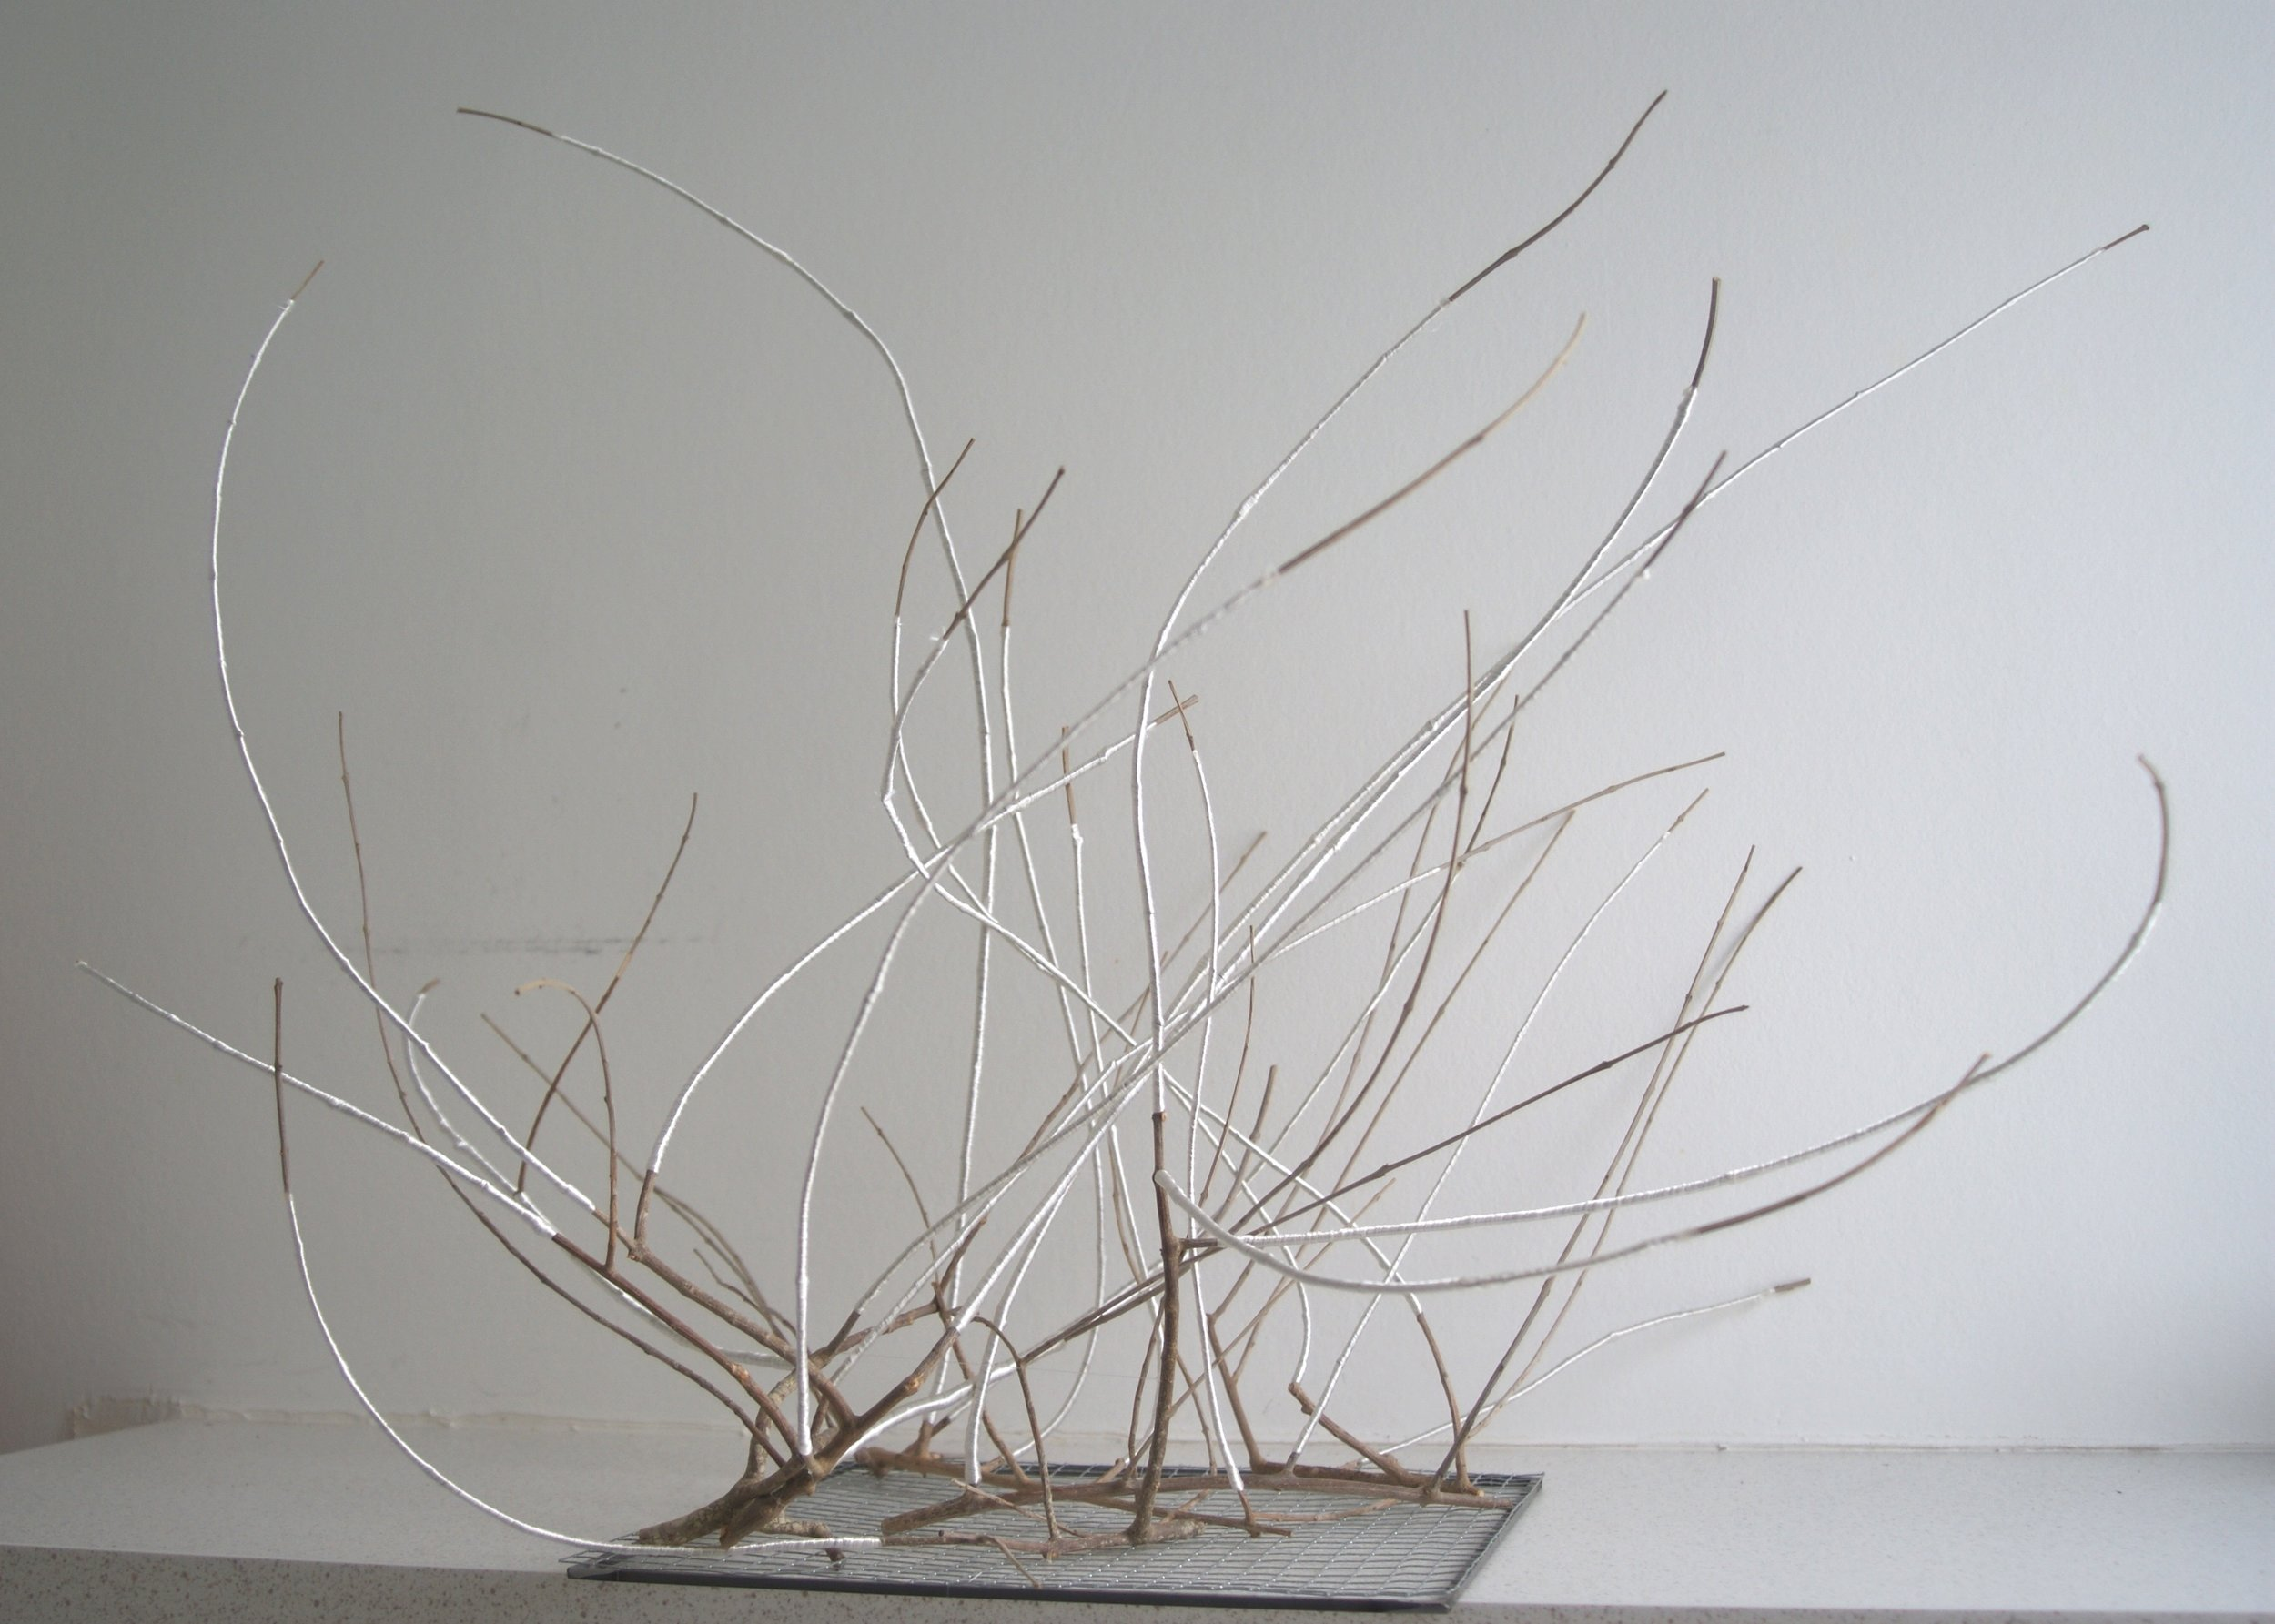 Edith Bruandet, Olivier 5, fil de soie, grillage, 60x75x60cm